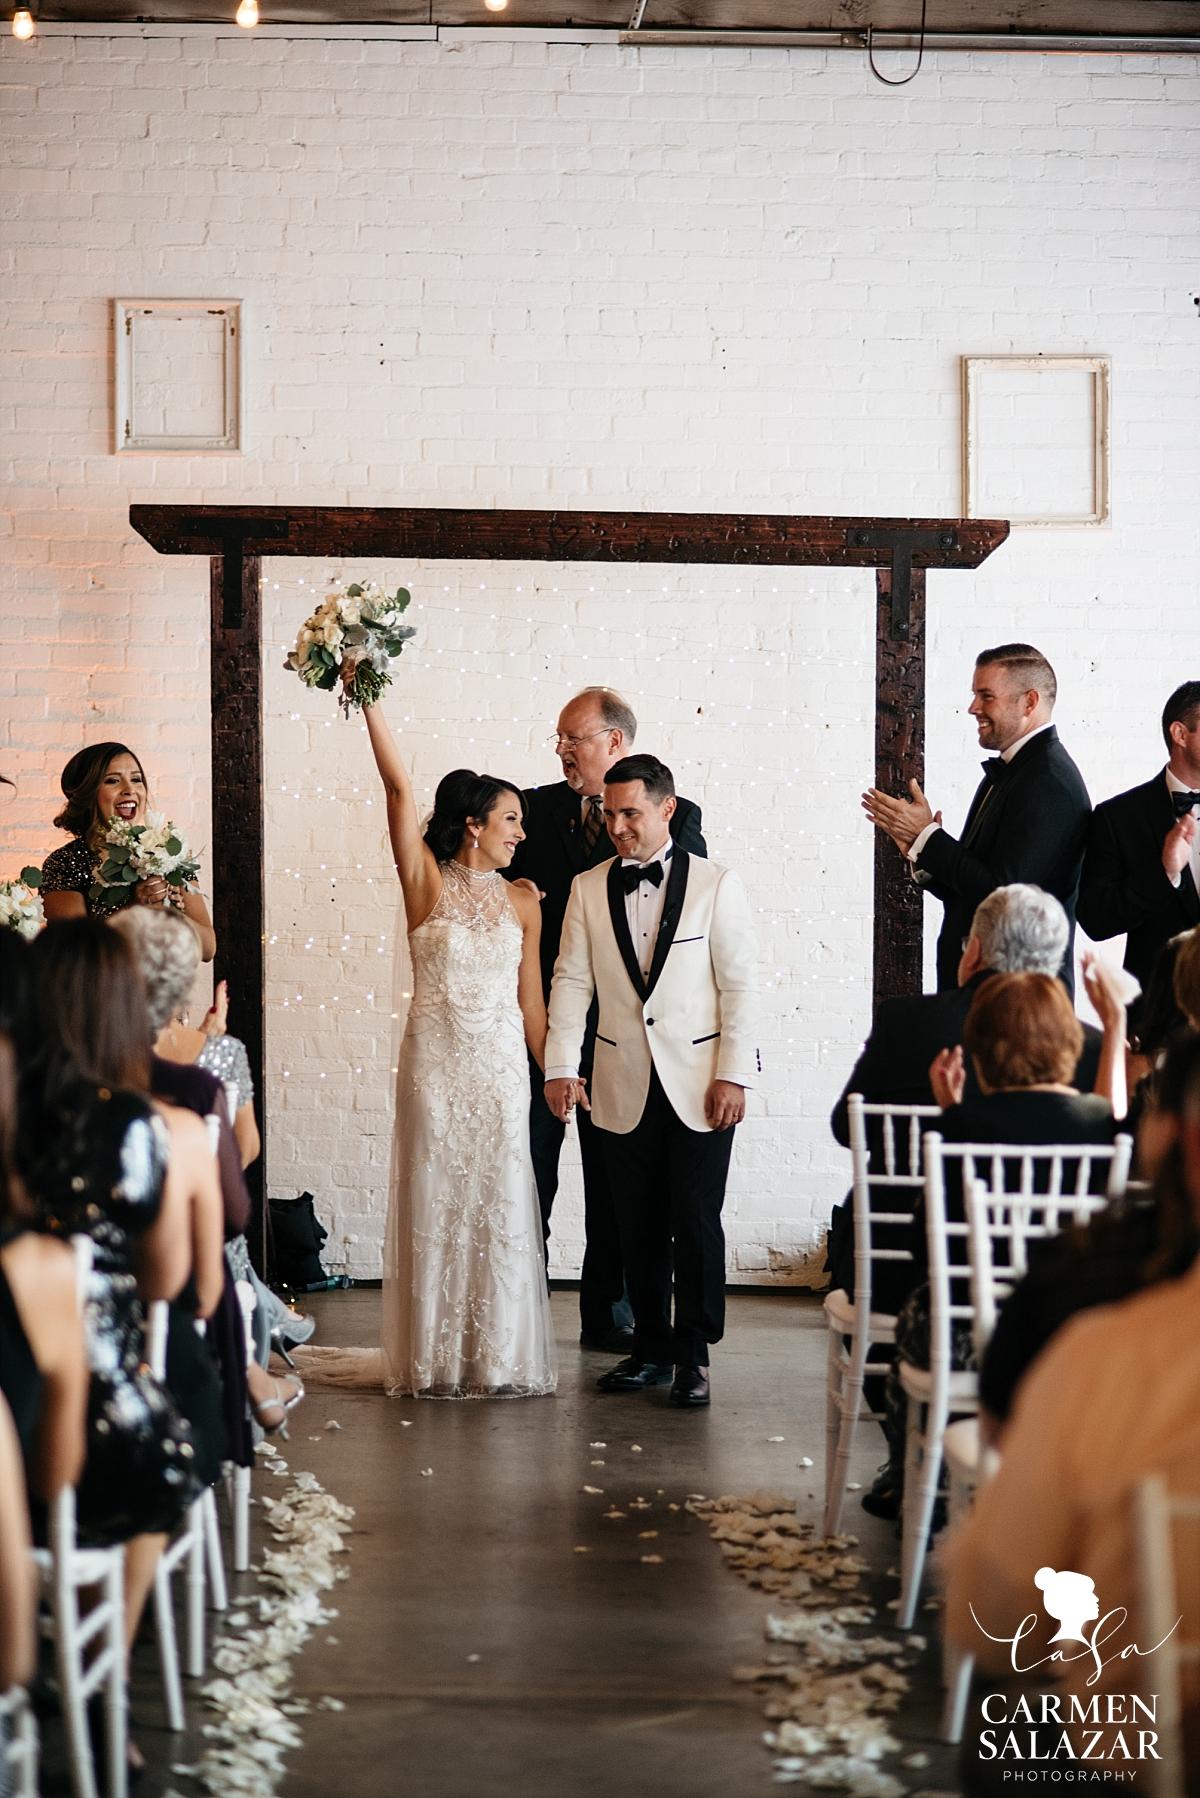 Happy newlyweds celebrating at The Find - Carmen Salazar